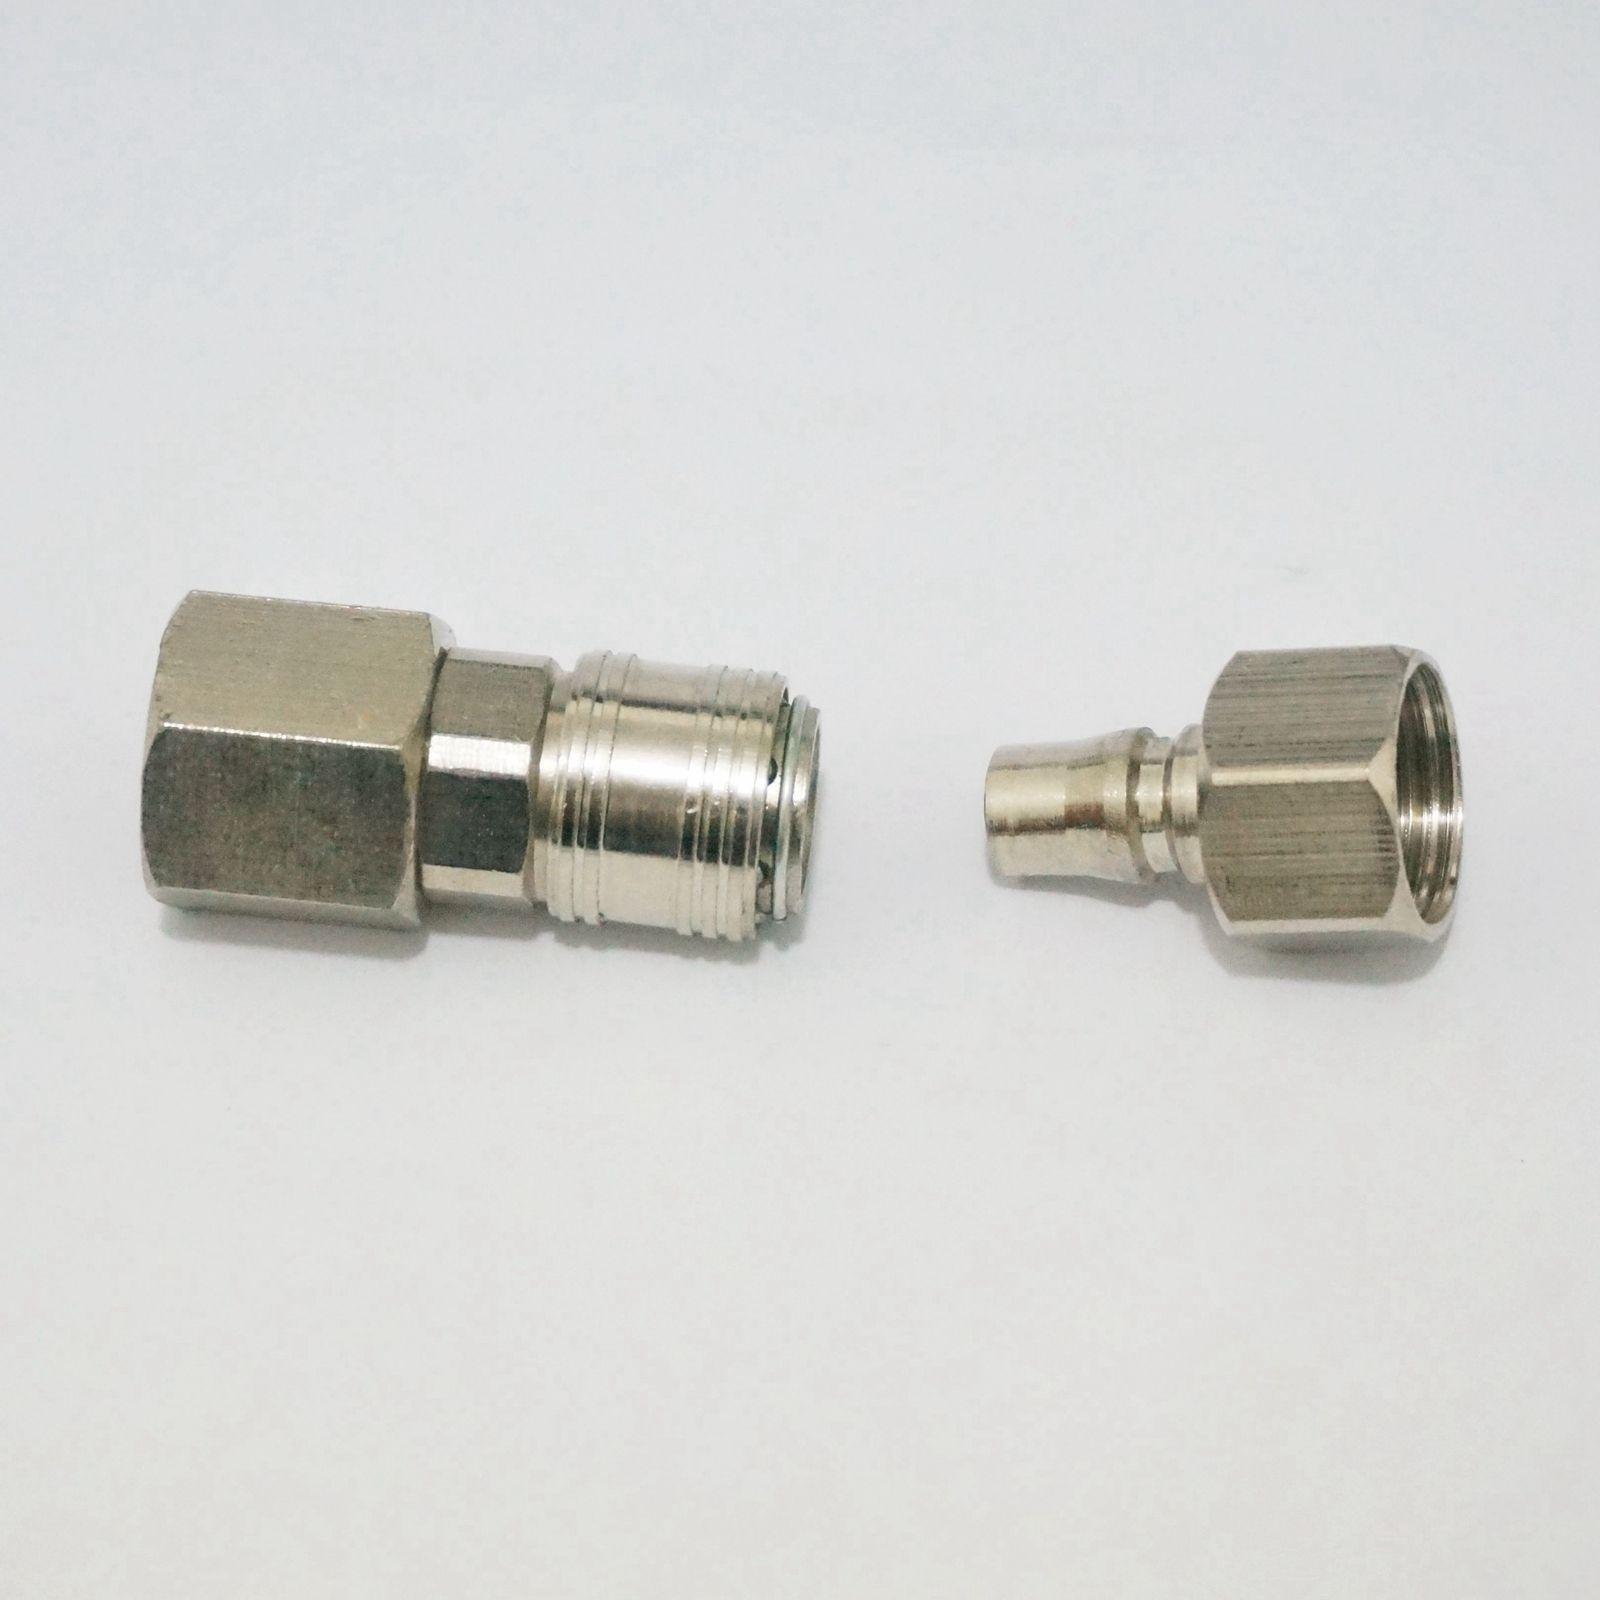 "Pneumatic SF40+PF40 1/2"" BSP Thread Air Compressor Hose"